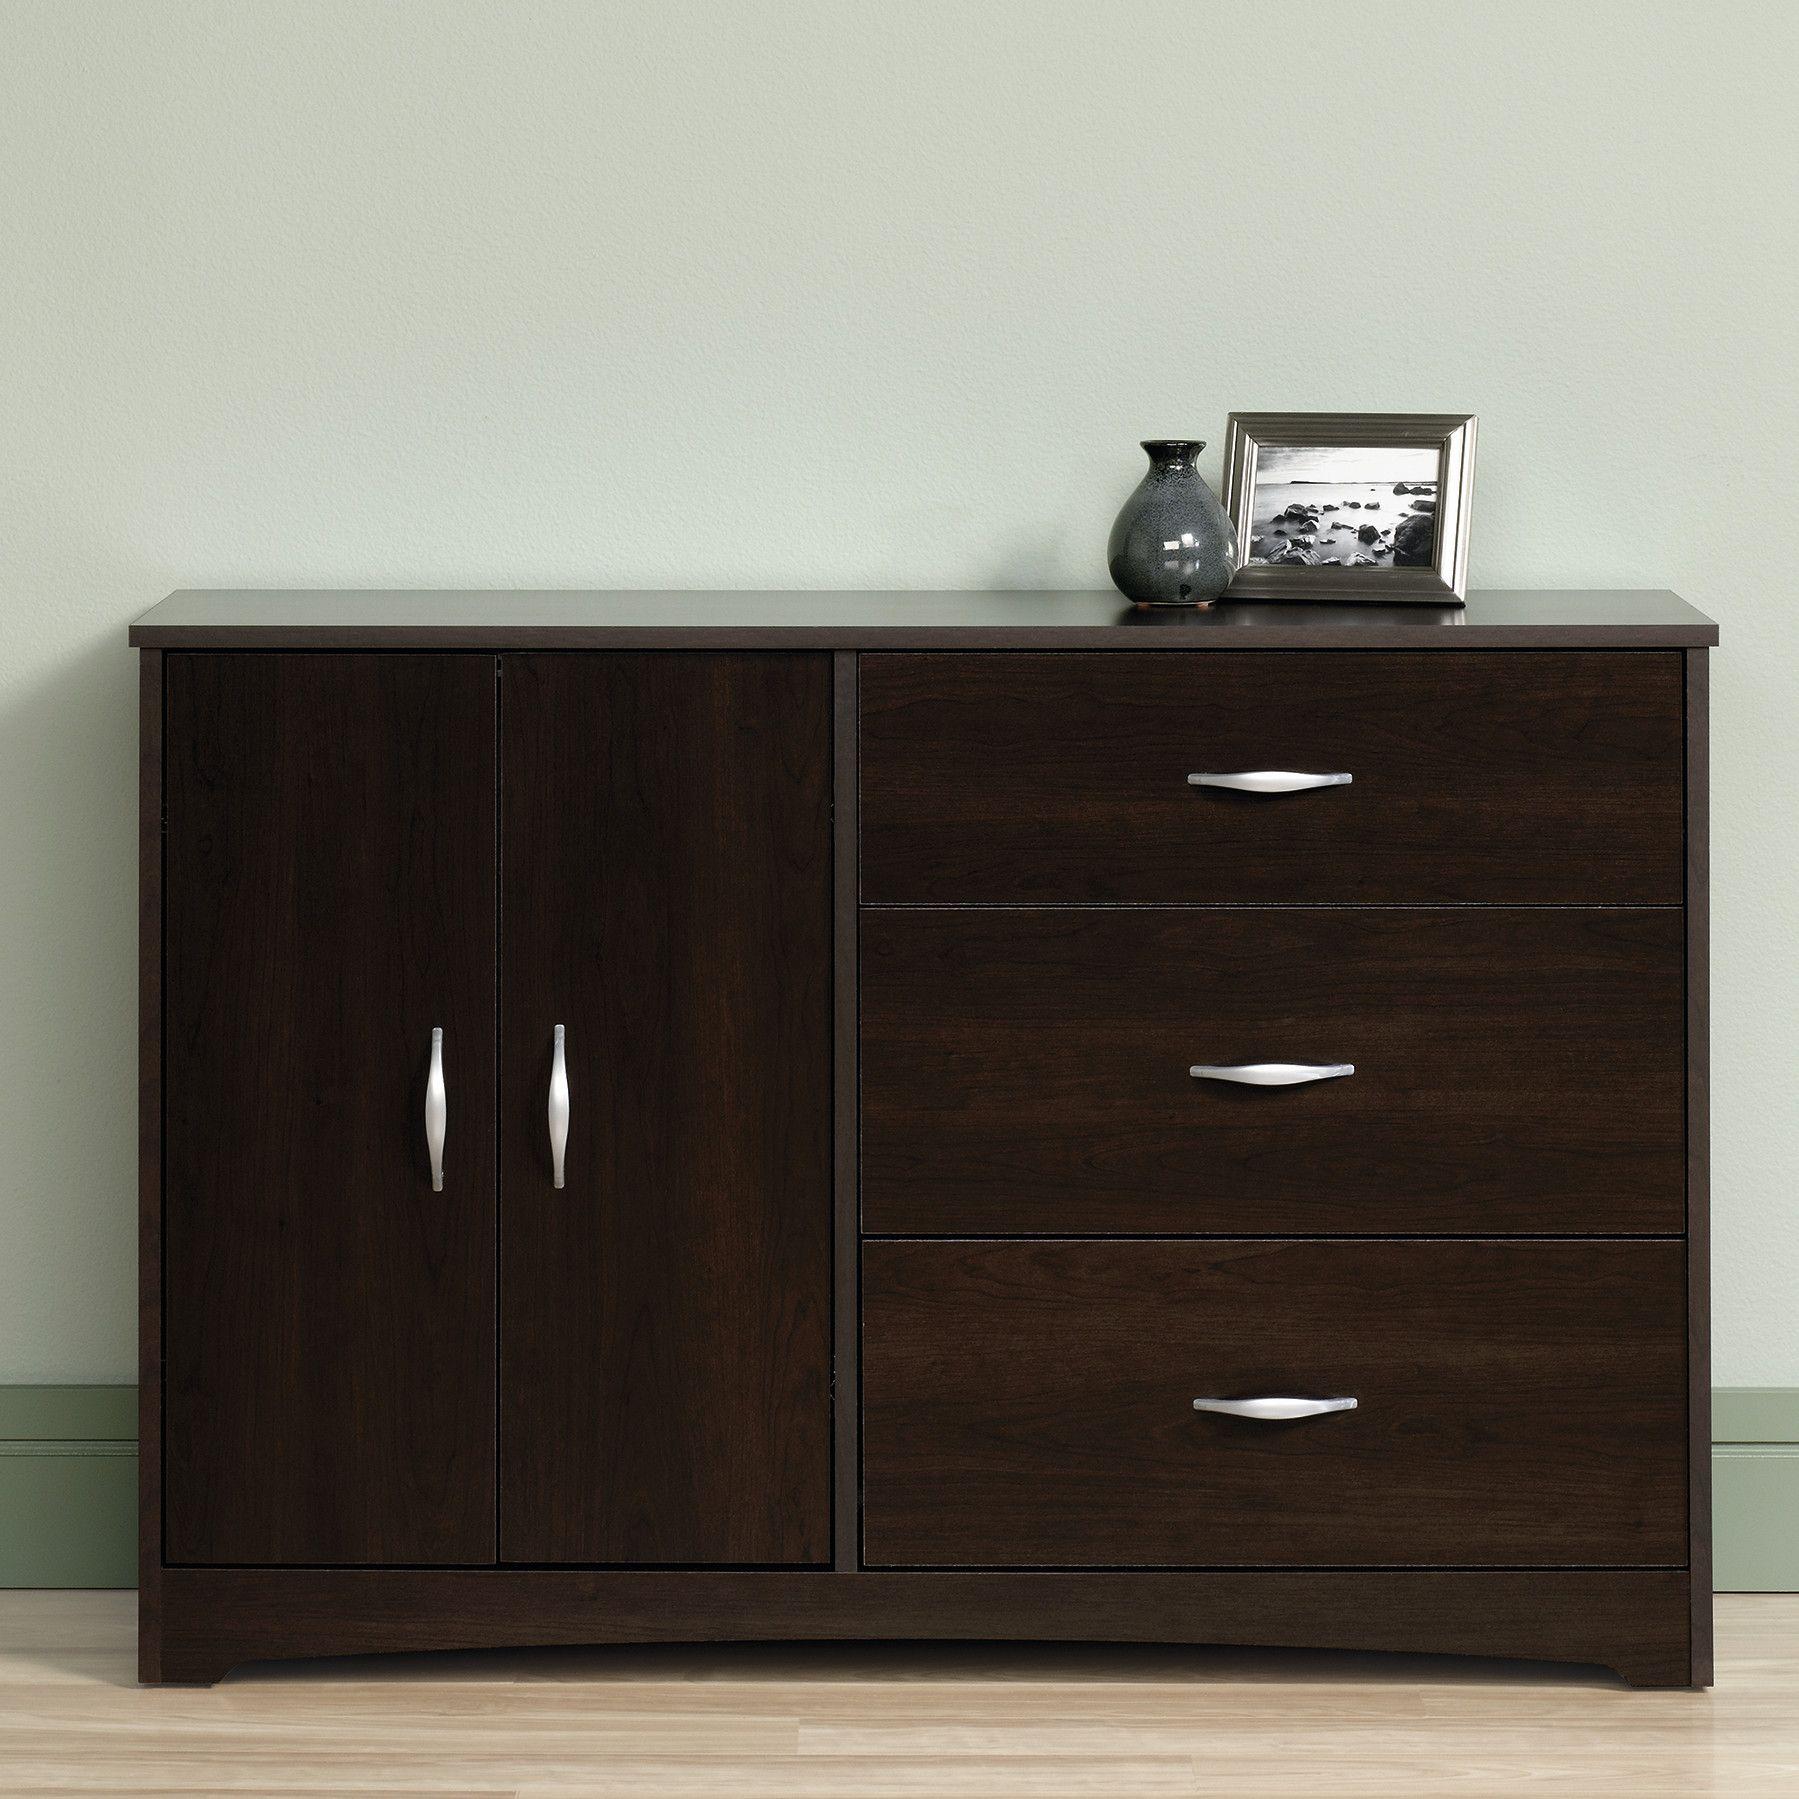 Beginnings 3 Drawer Combo Dresser in Cinnamon Cherry 3